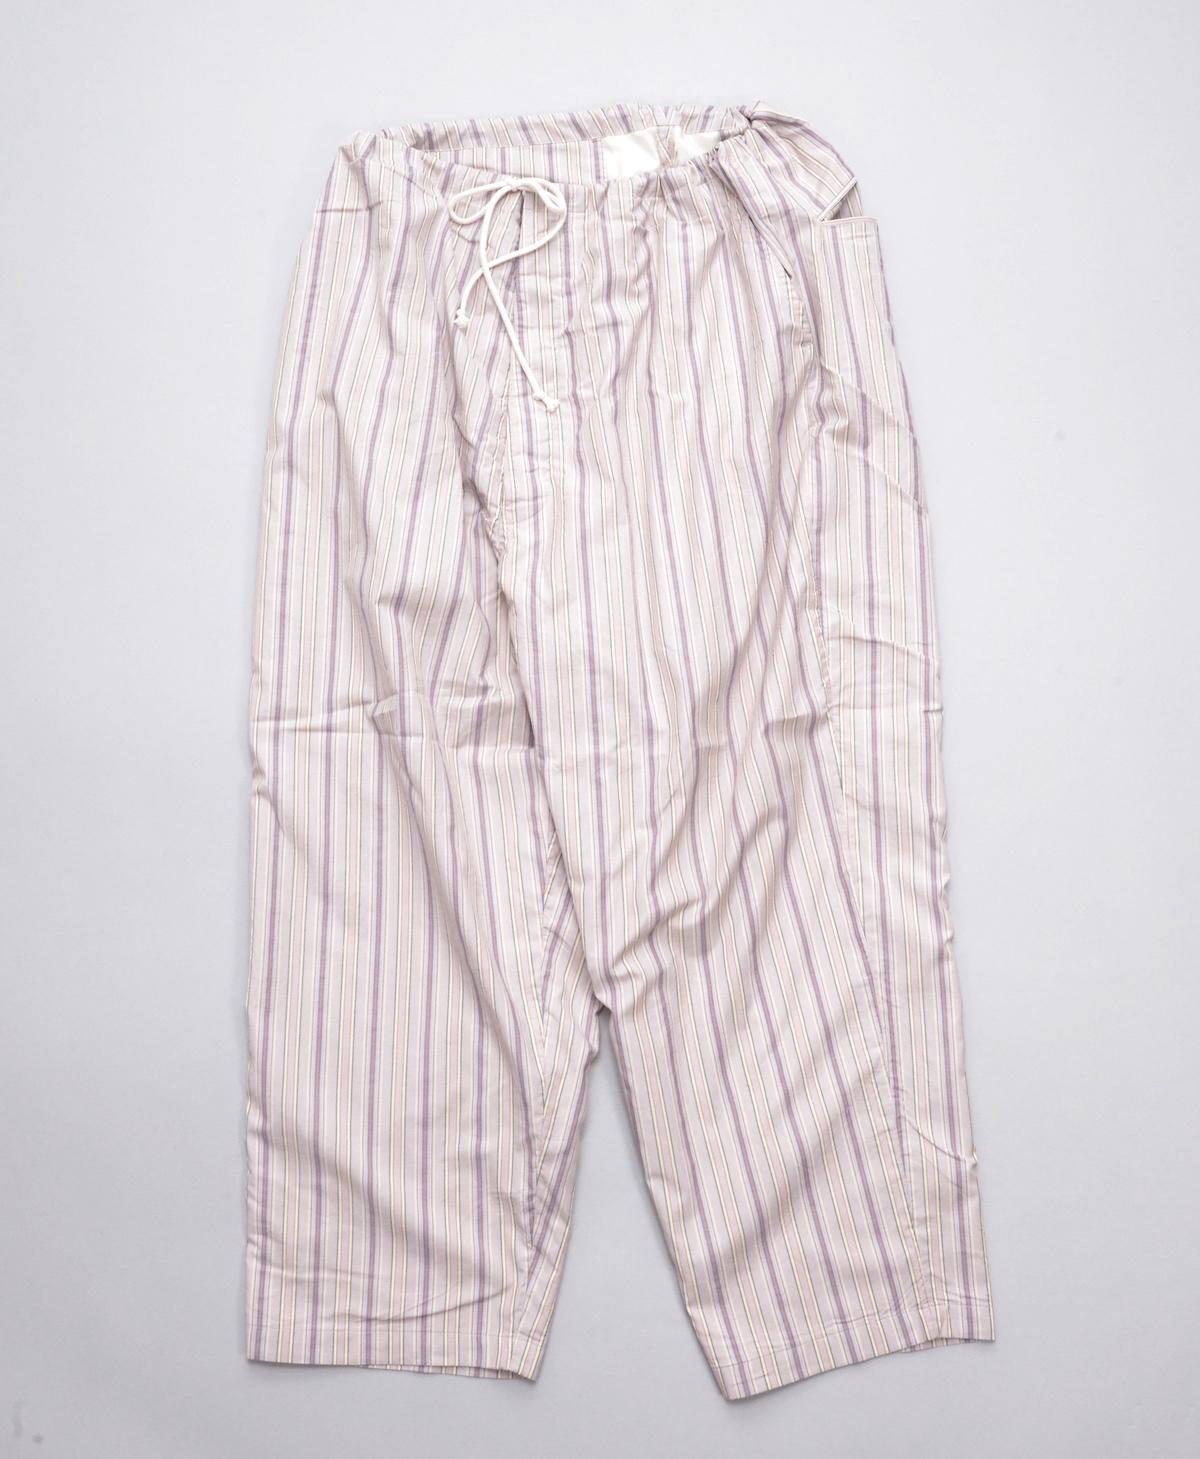 Marvine Pontiak shirt makers 「 Pajama Pants 2 / Beige Pink ST 」